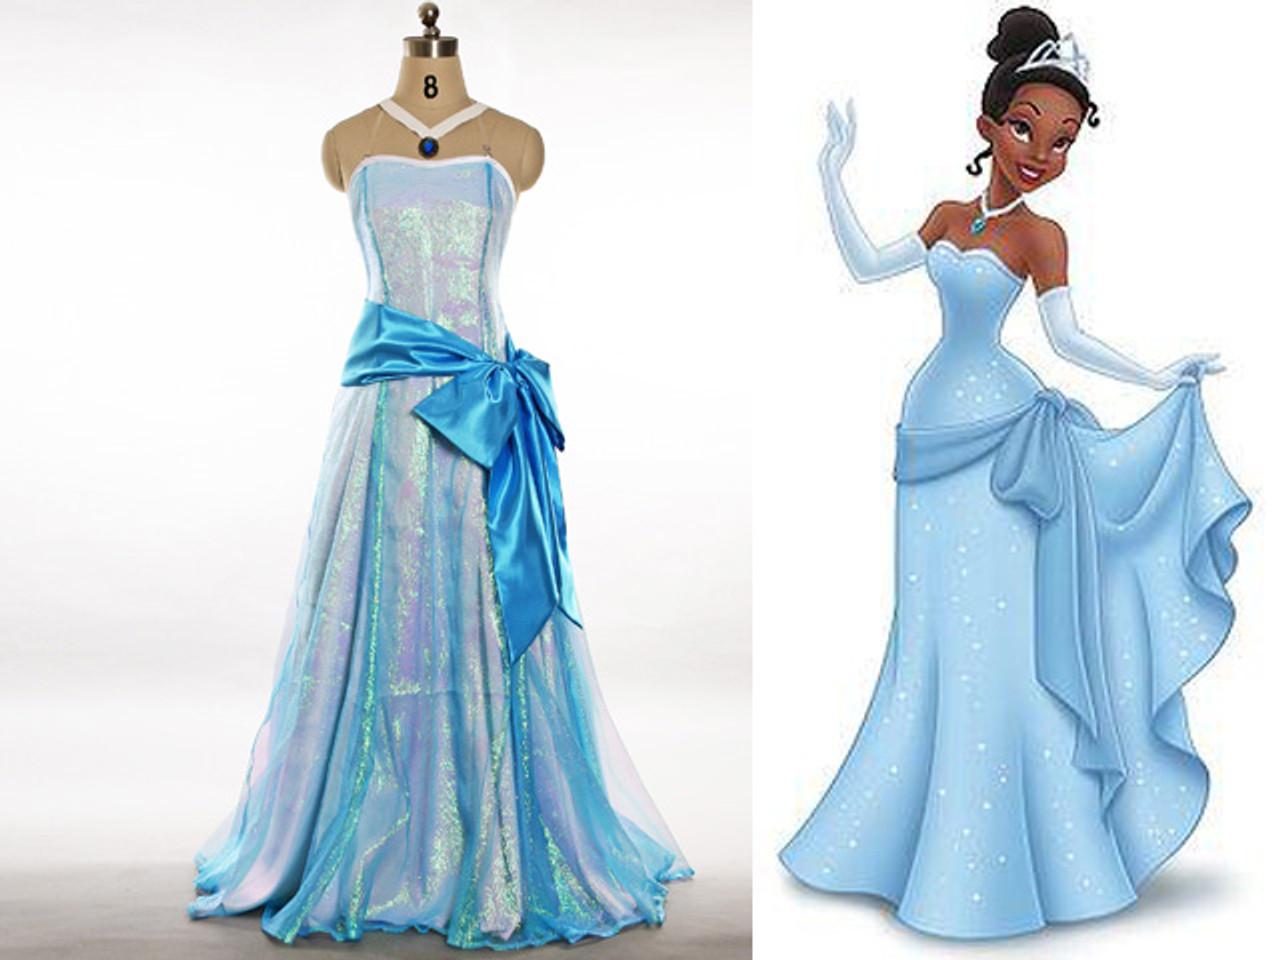 Disney The Princess and The Frog Cosplay Tiana Dress Set